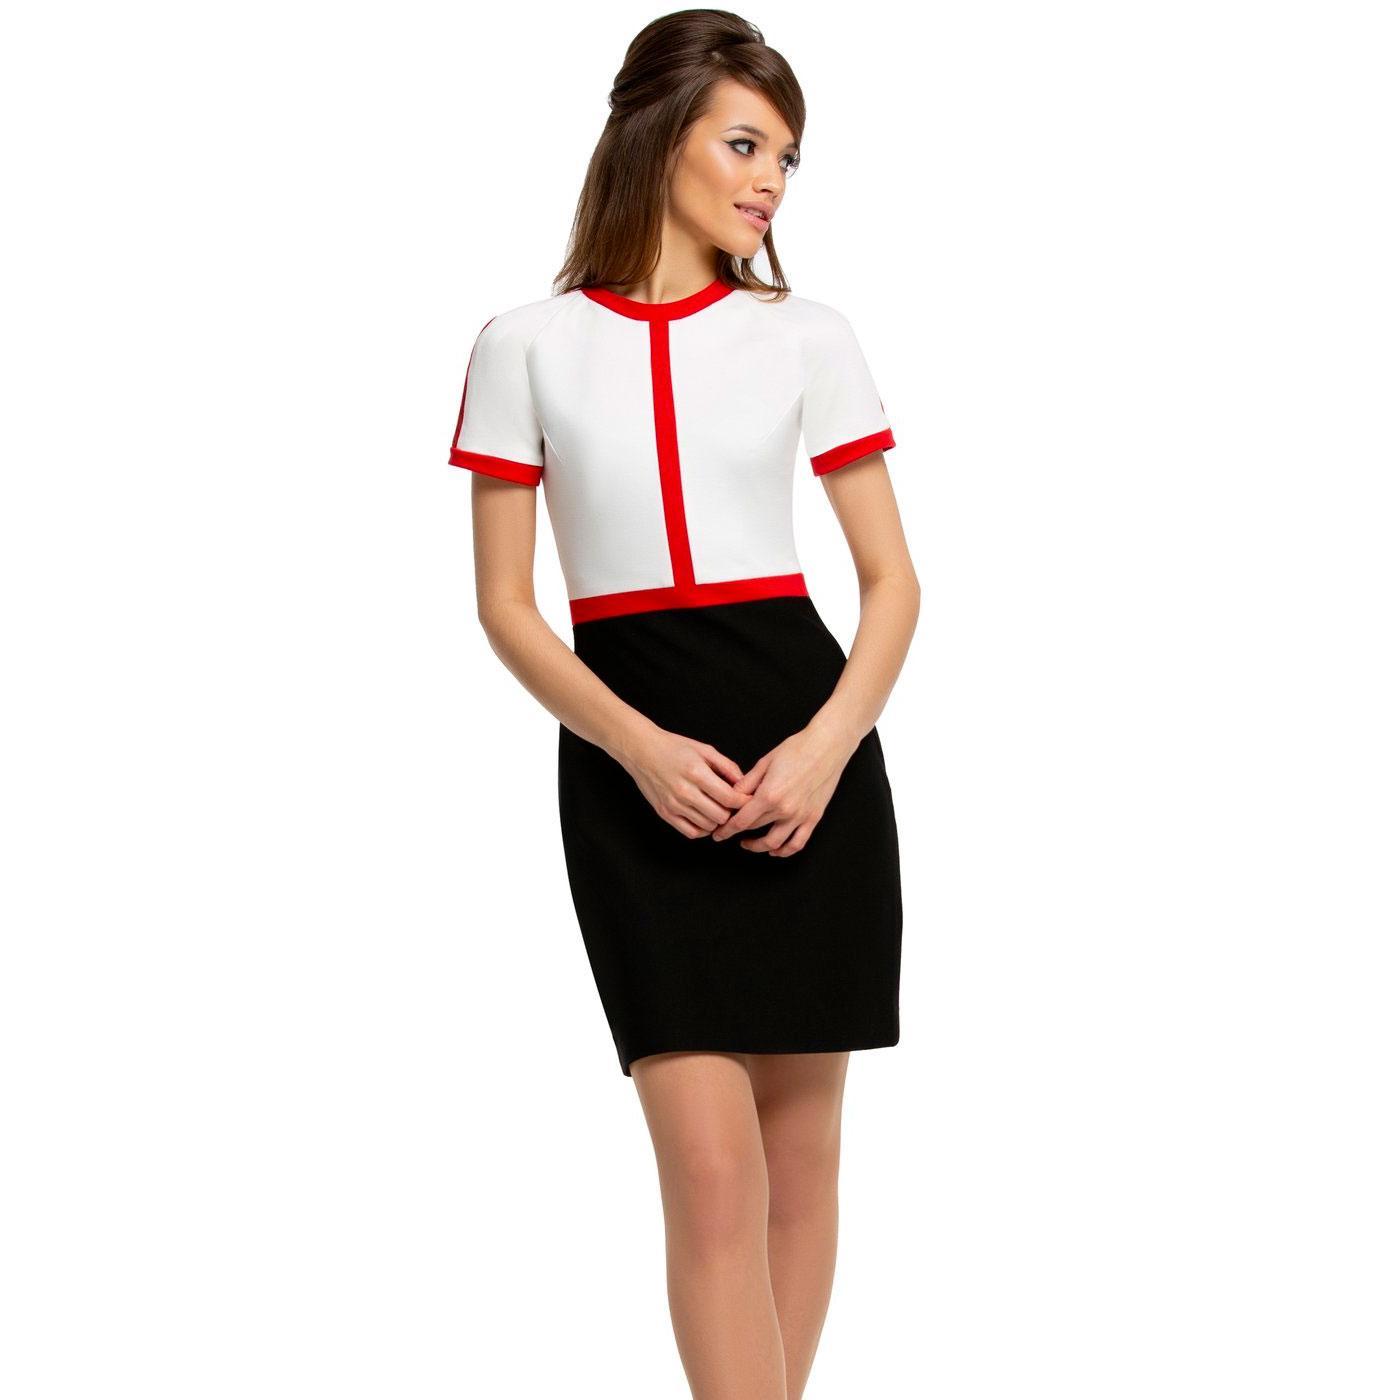 MARMALADE 60s Mod Colour Block Mini Dress (B/R/LC)